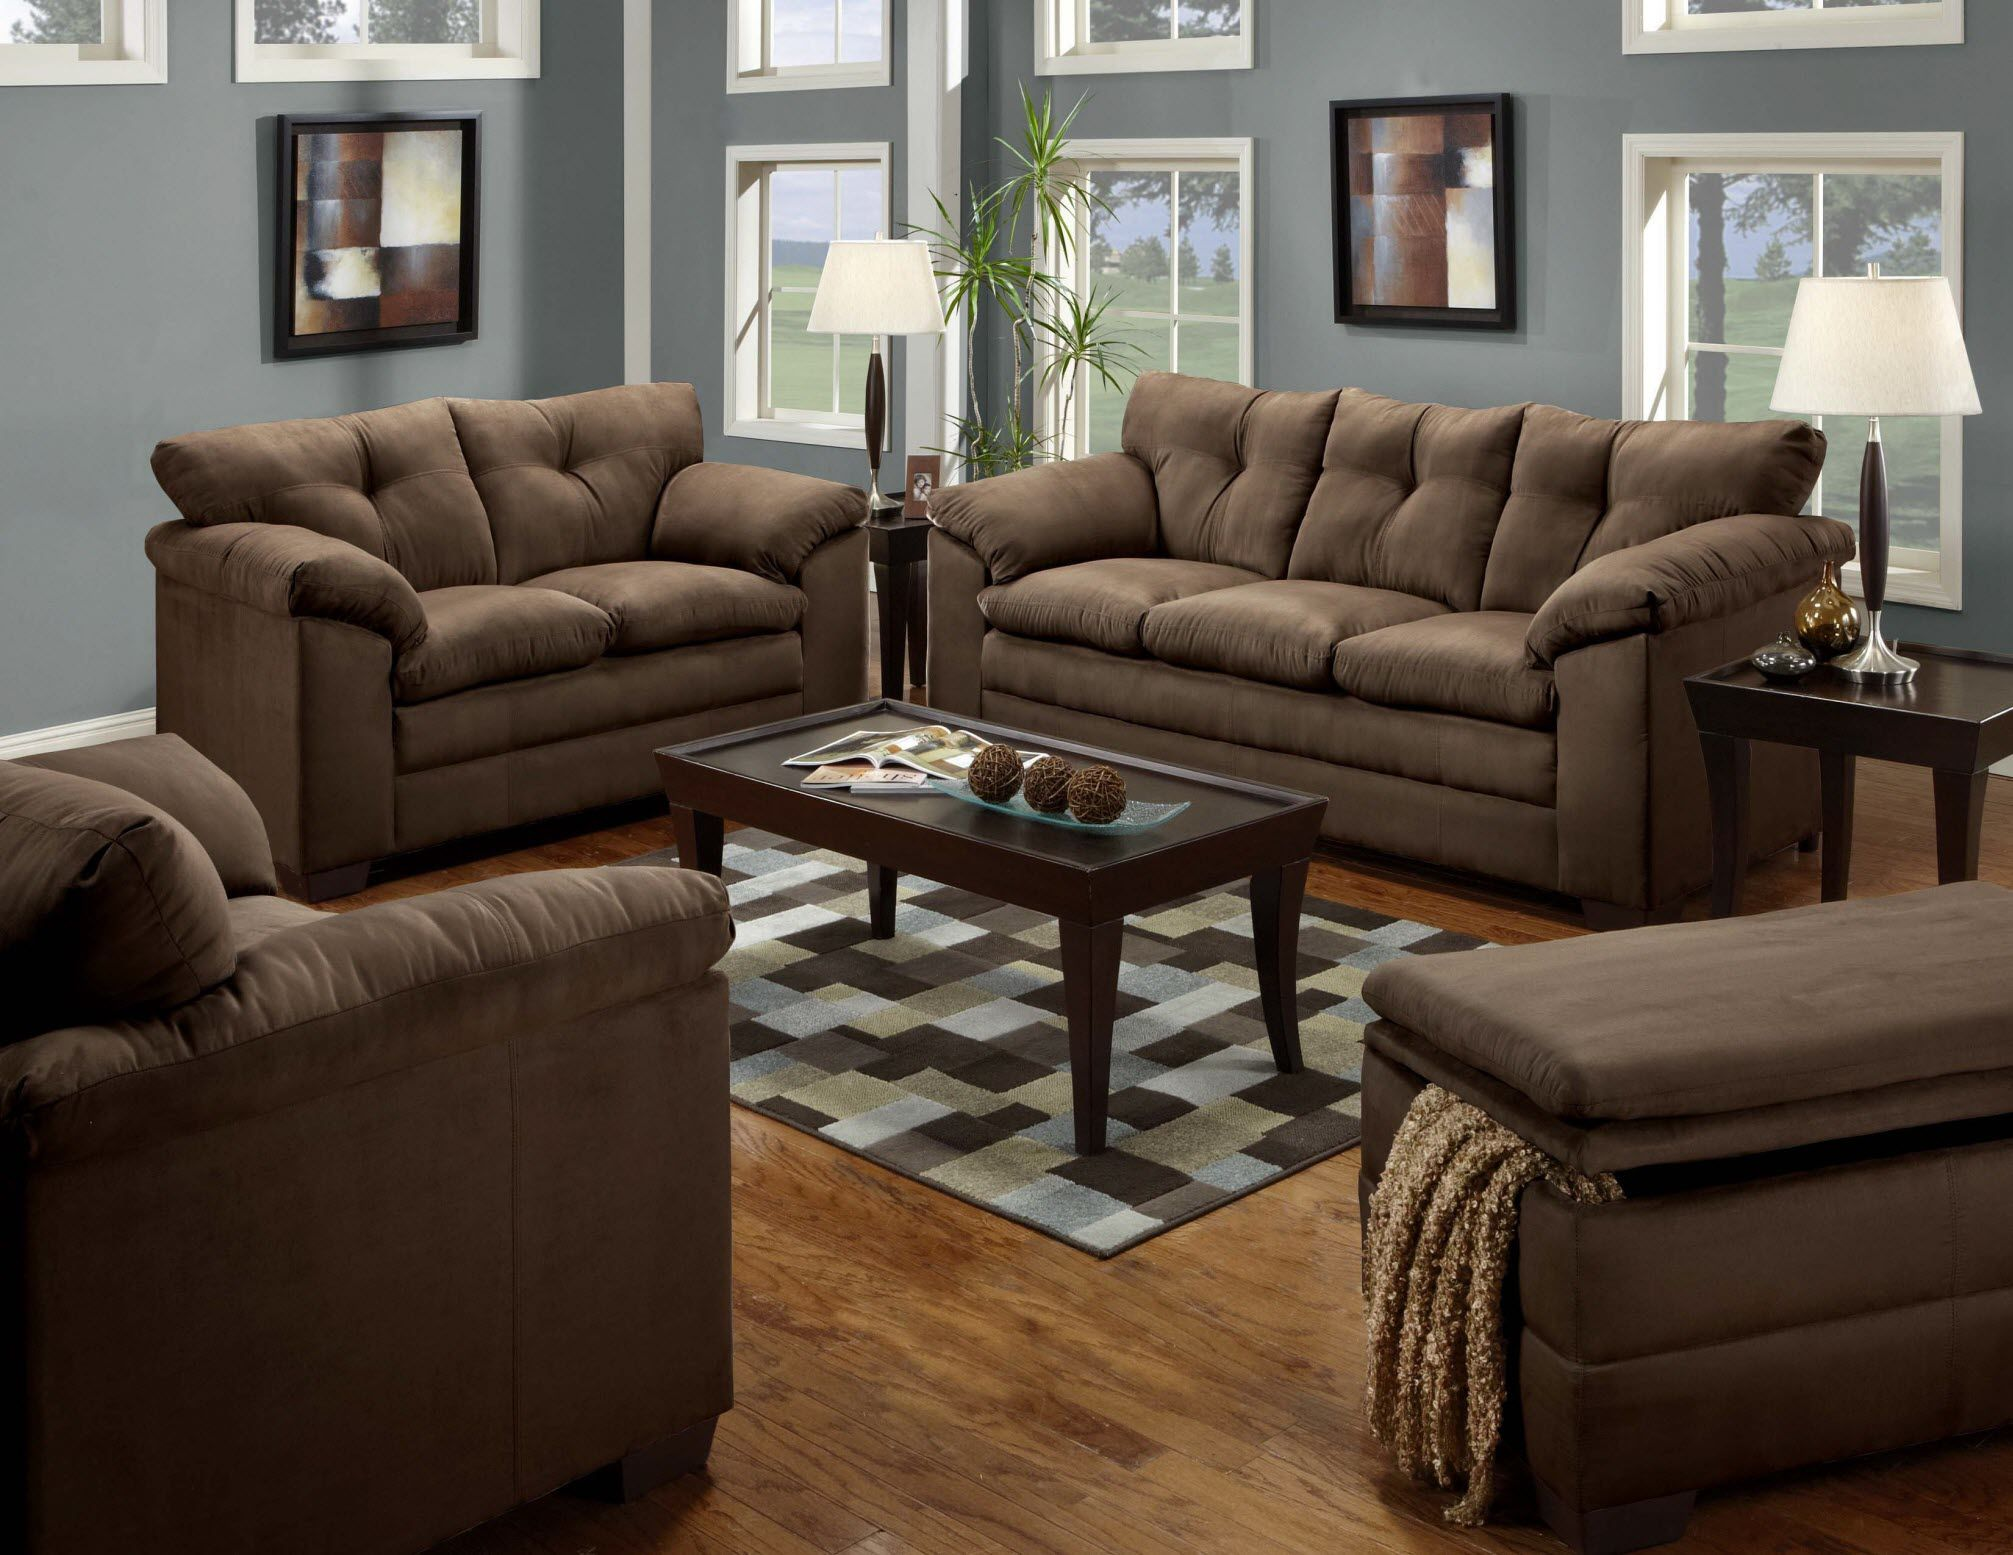 Luna Chocolate Sofa & Loveseat - $658 www.furnitureurban.com - Other ...